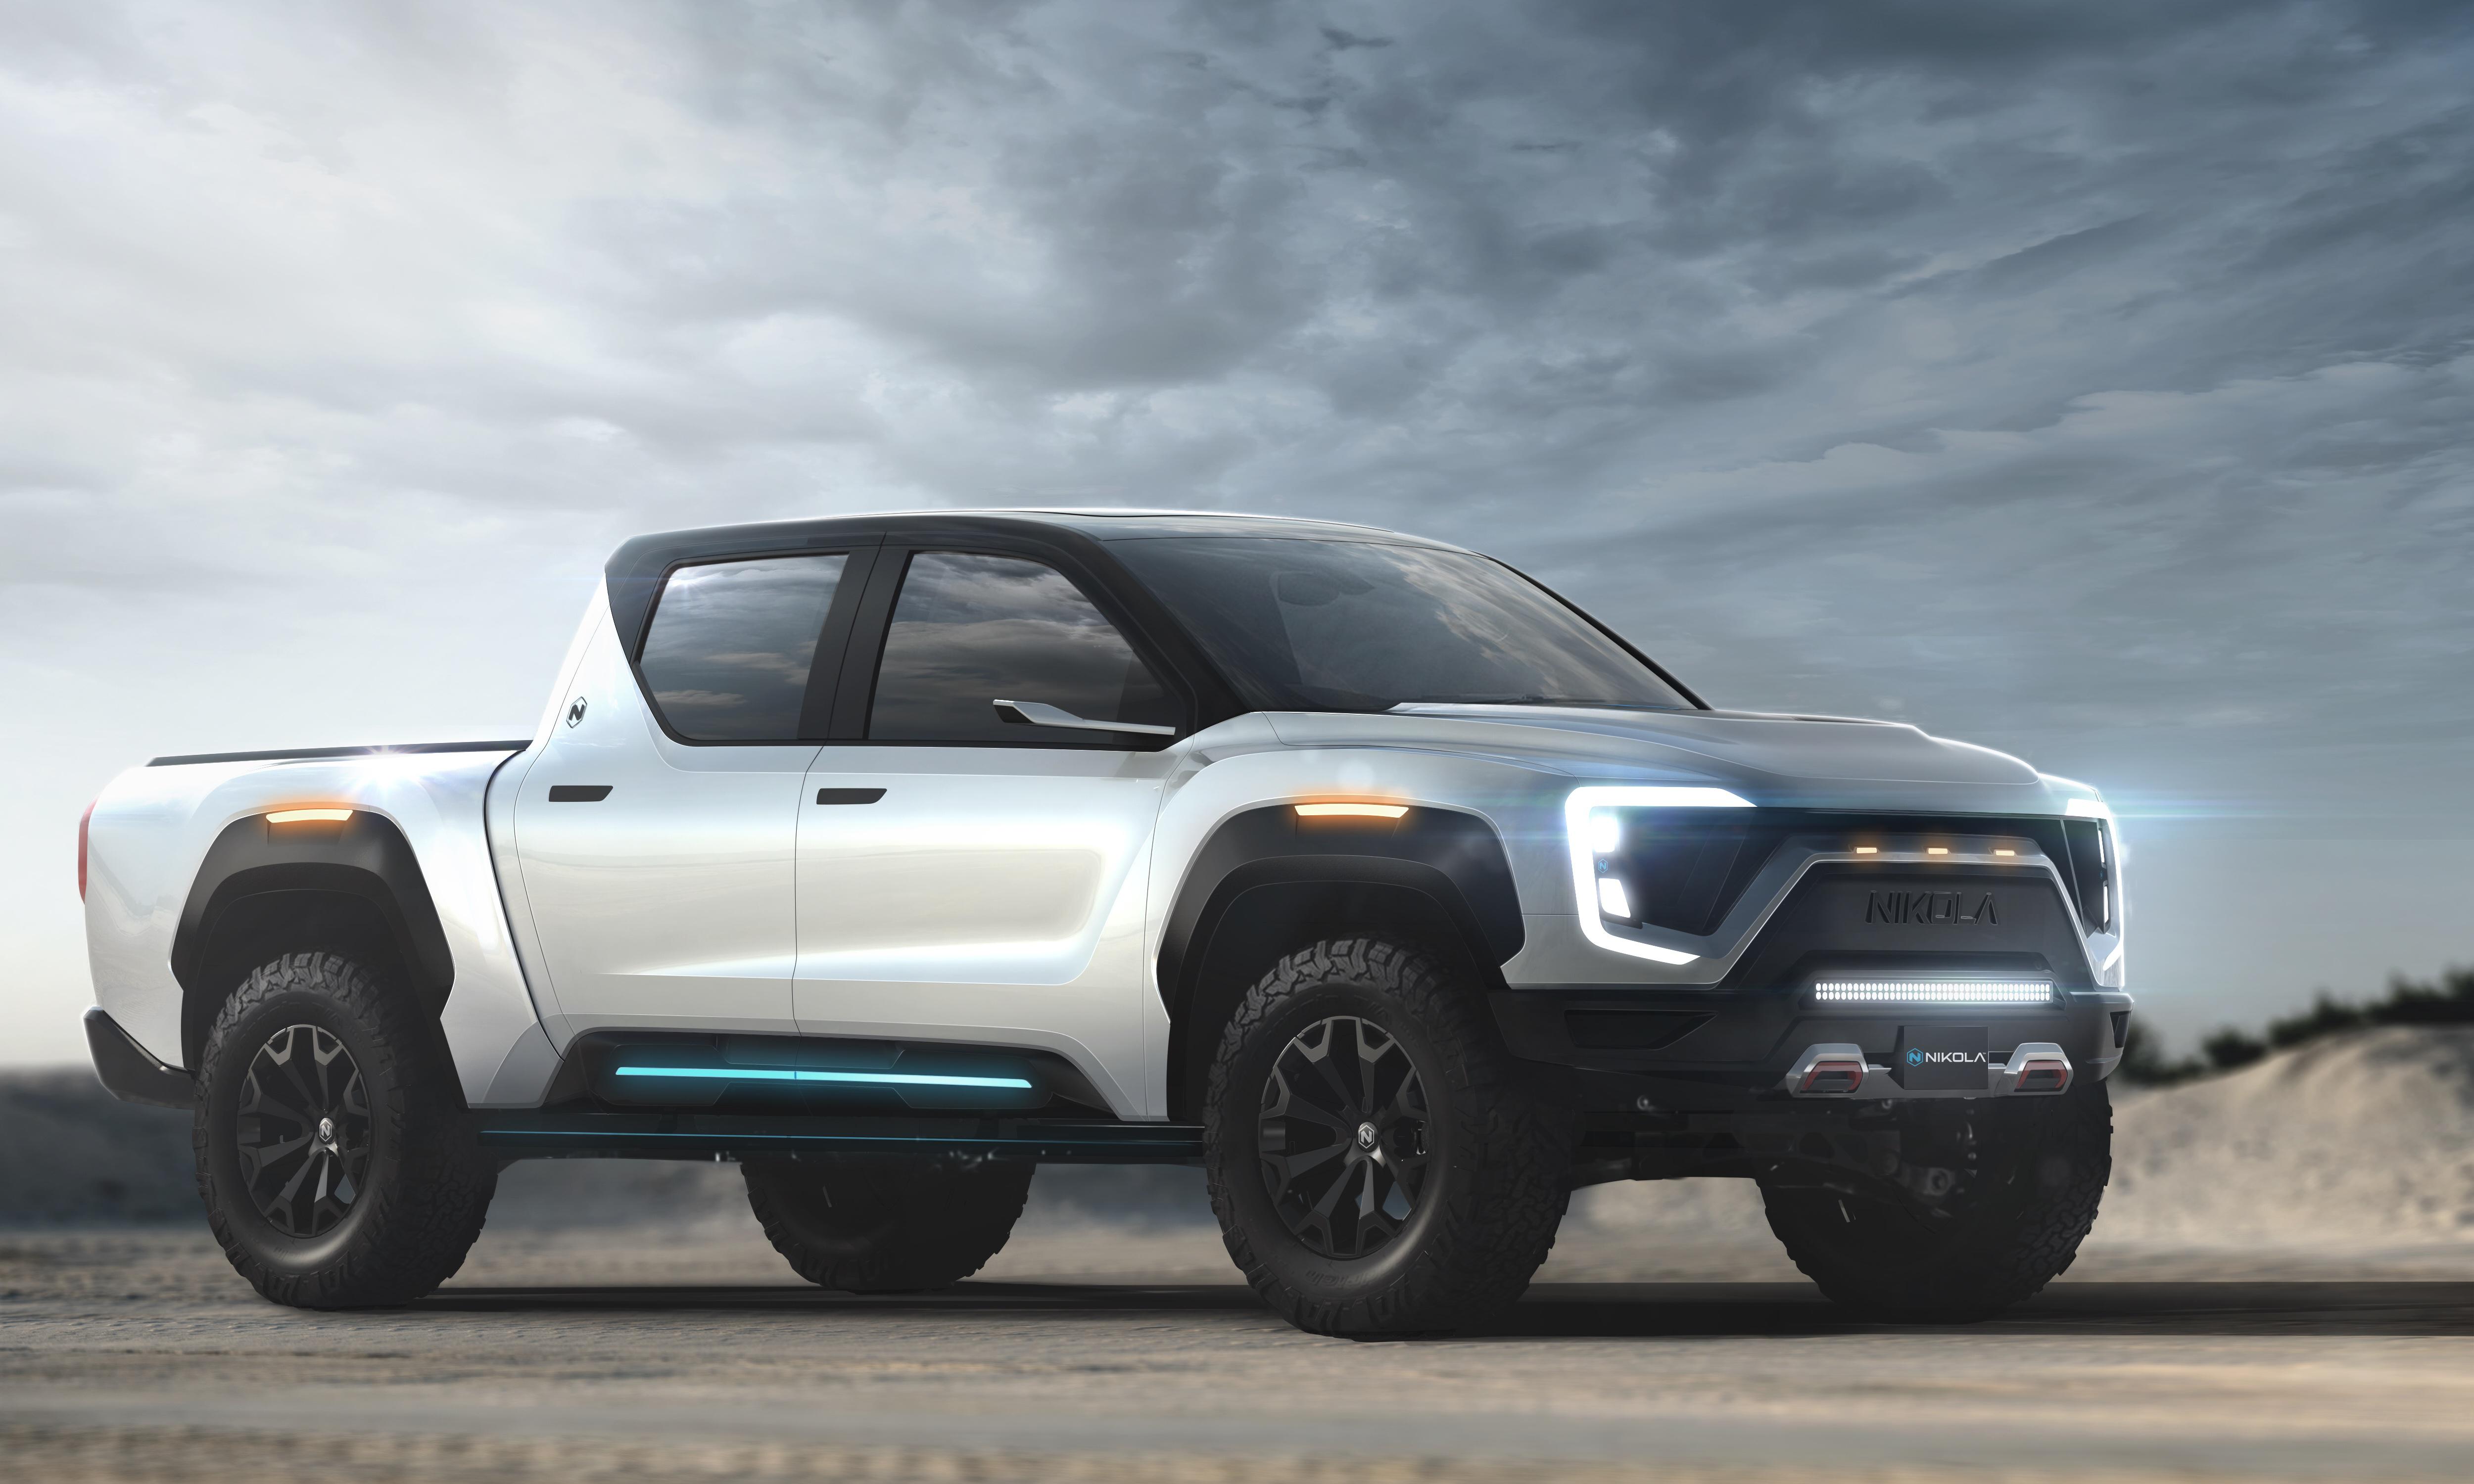 New electric pickup truck from Nikola touts 600-mile range